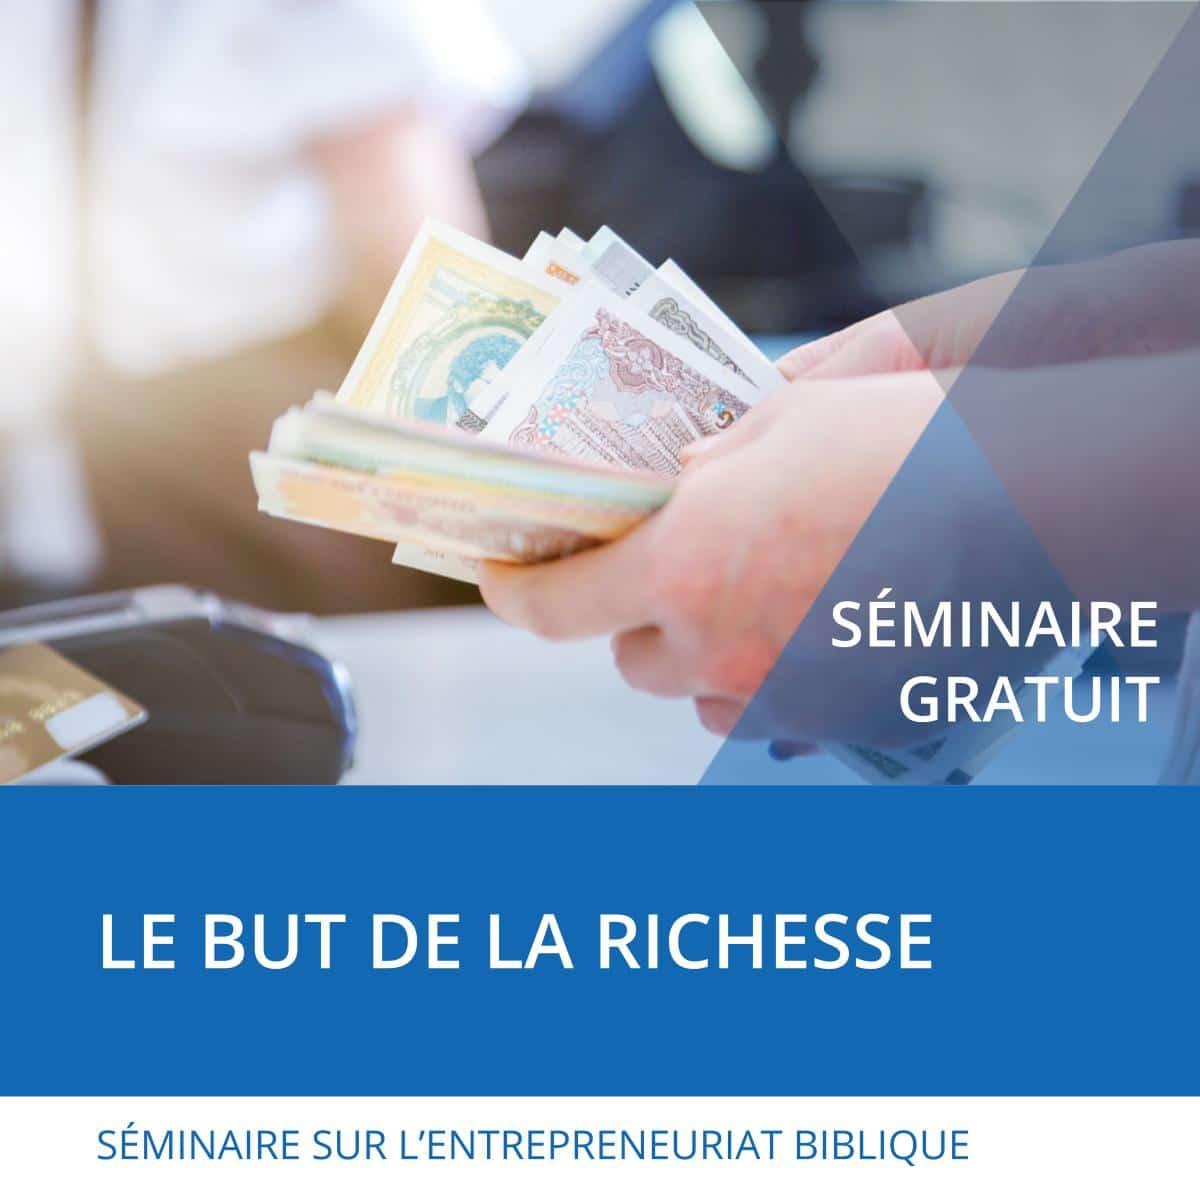 BE Seminar Promo All Topics Social Media FR 4 - Nehemiah E-Community